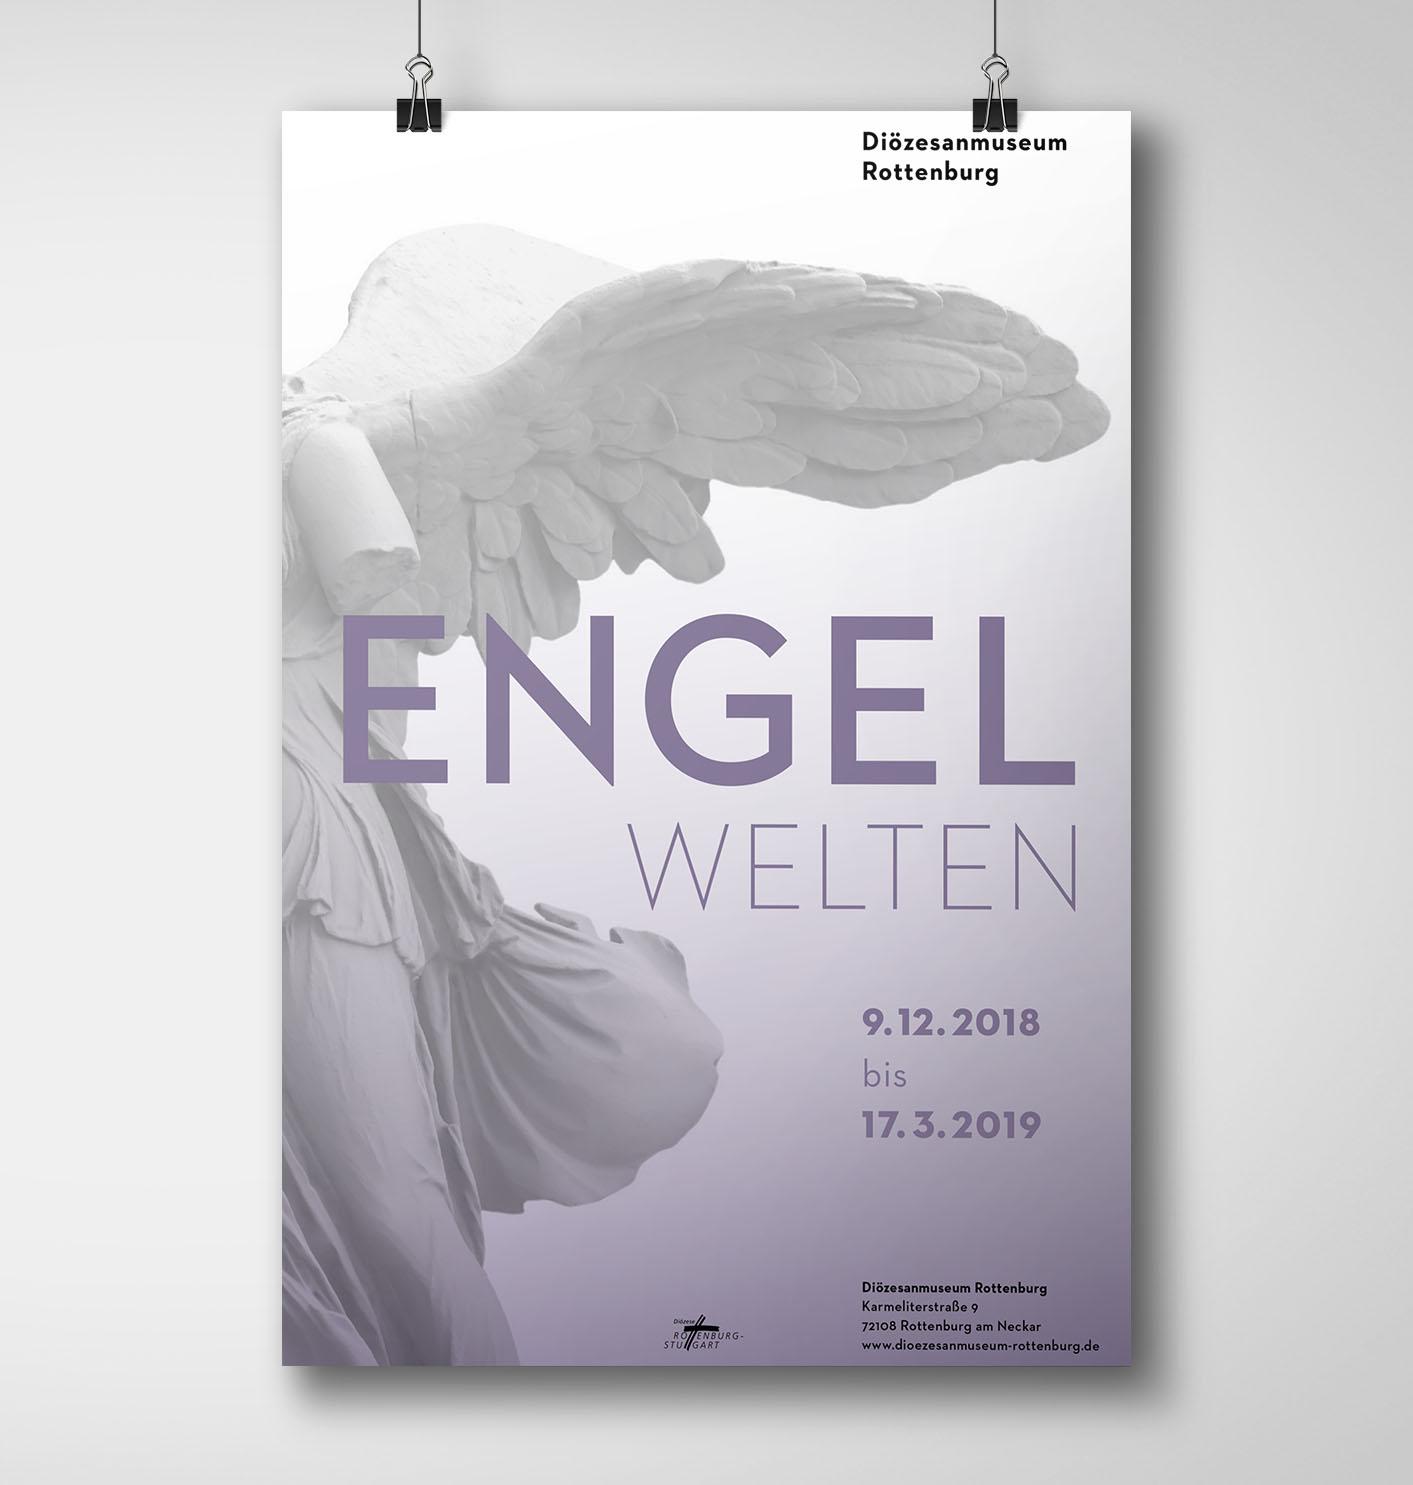 Demirag-architekten-rottenburg-diözesan-museum-ausstellung-engel-welten-plakat.jpg